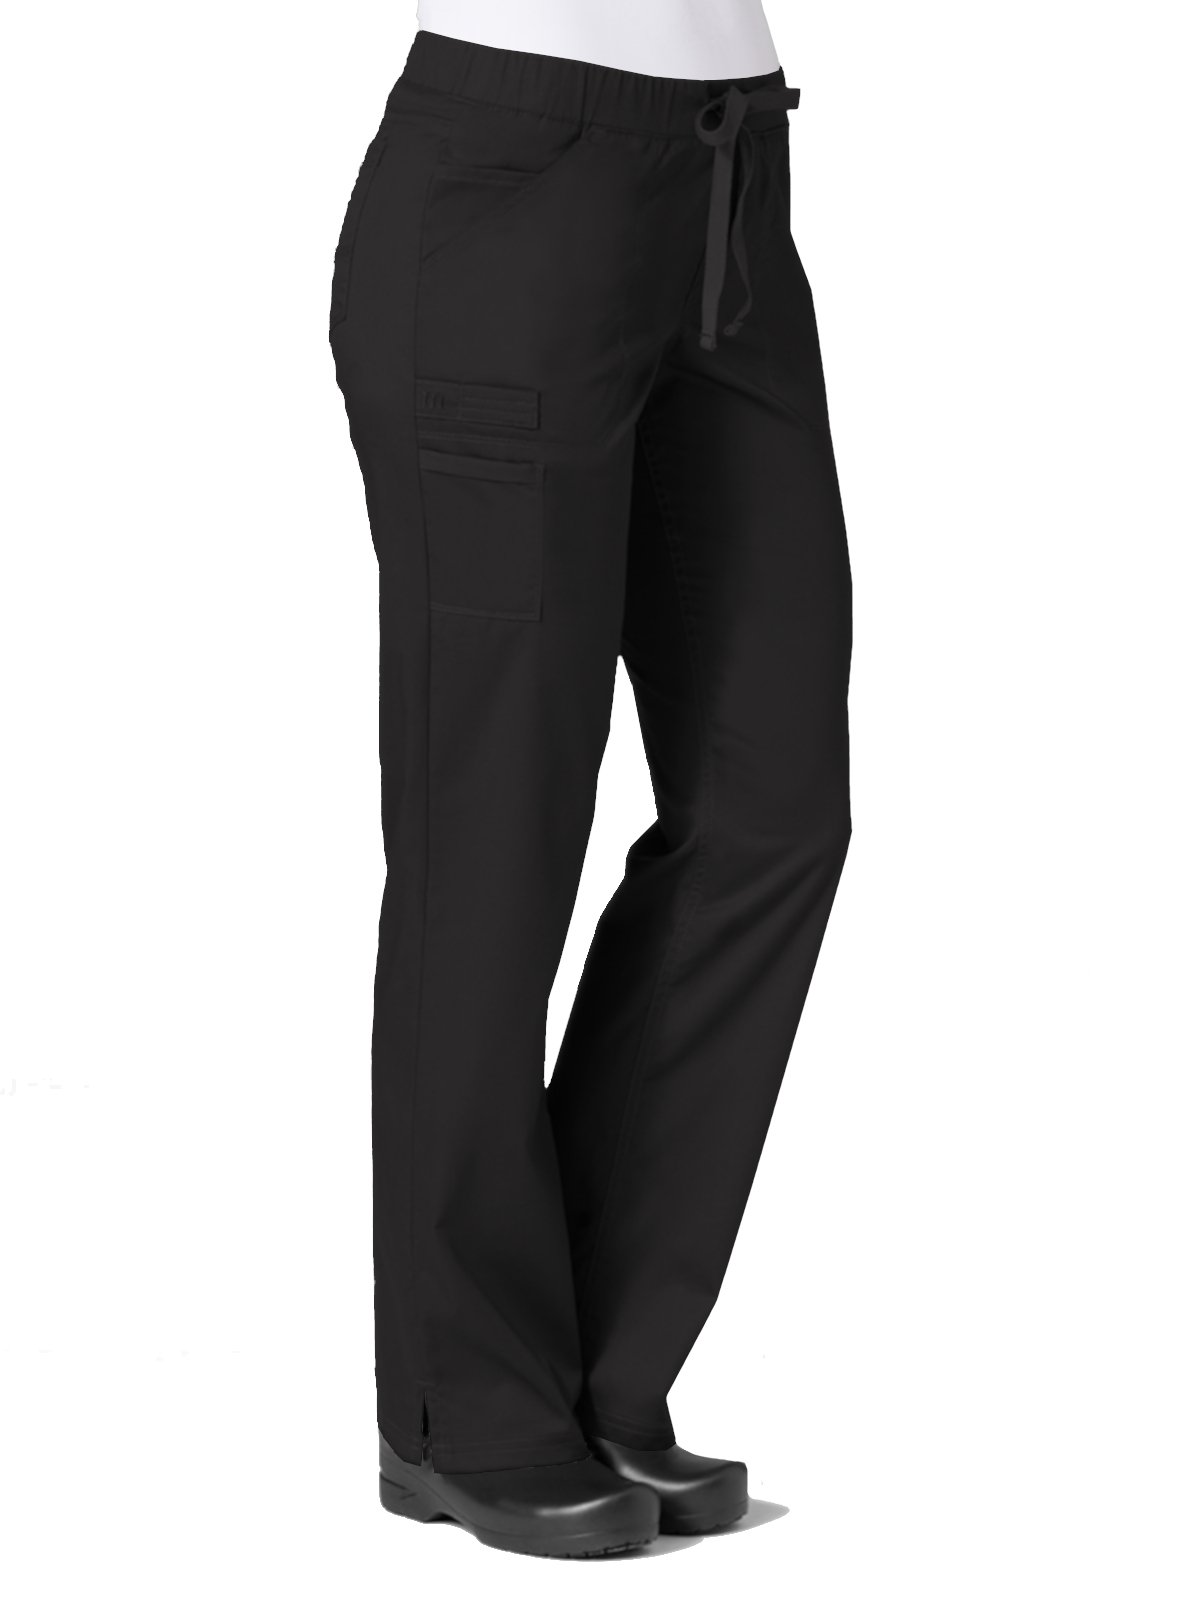 PrimaFlex by Maevn Women's Straight Leg Scrub Pant Large Petite Black by Maevn